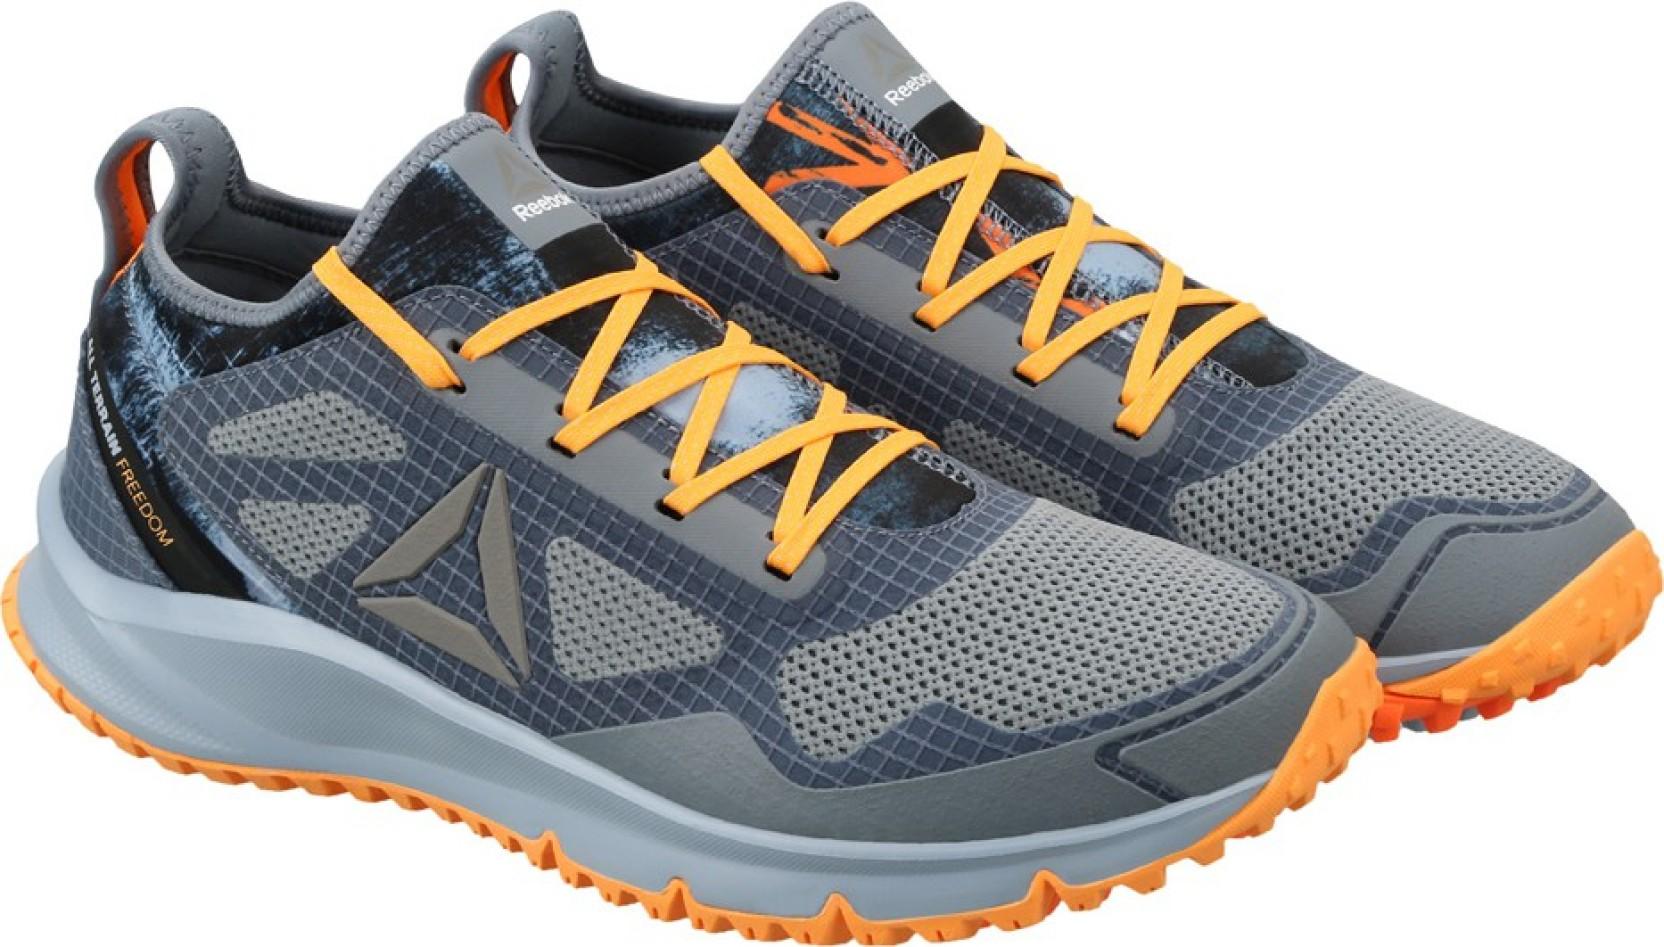 4a9705cff94 REEBOK ALL TERRAIN FREEDOM Running Shoes For Men - Buy DUST GREY ...